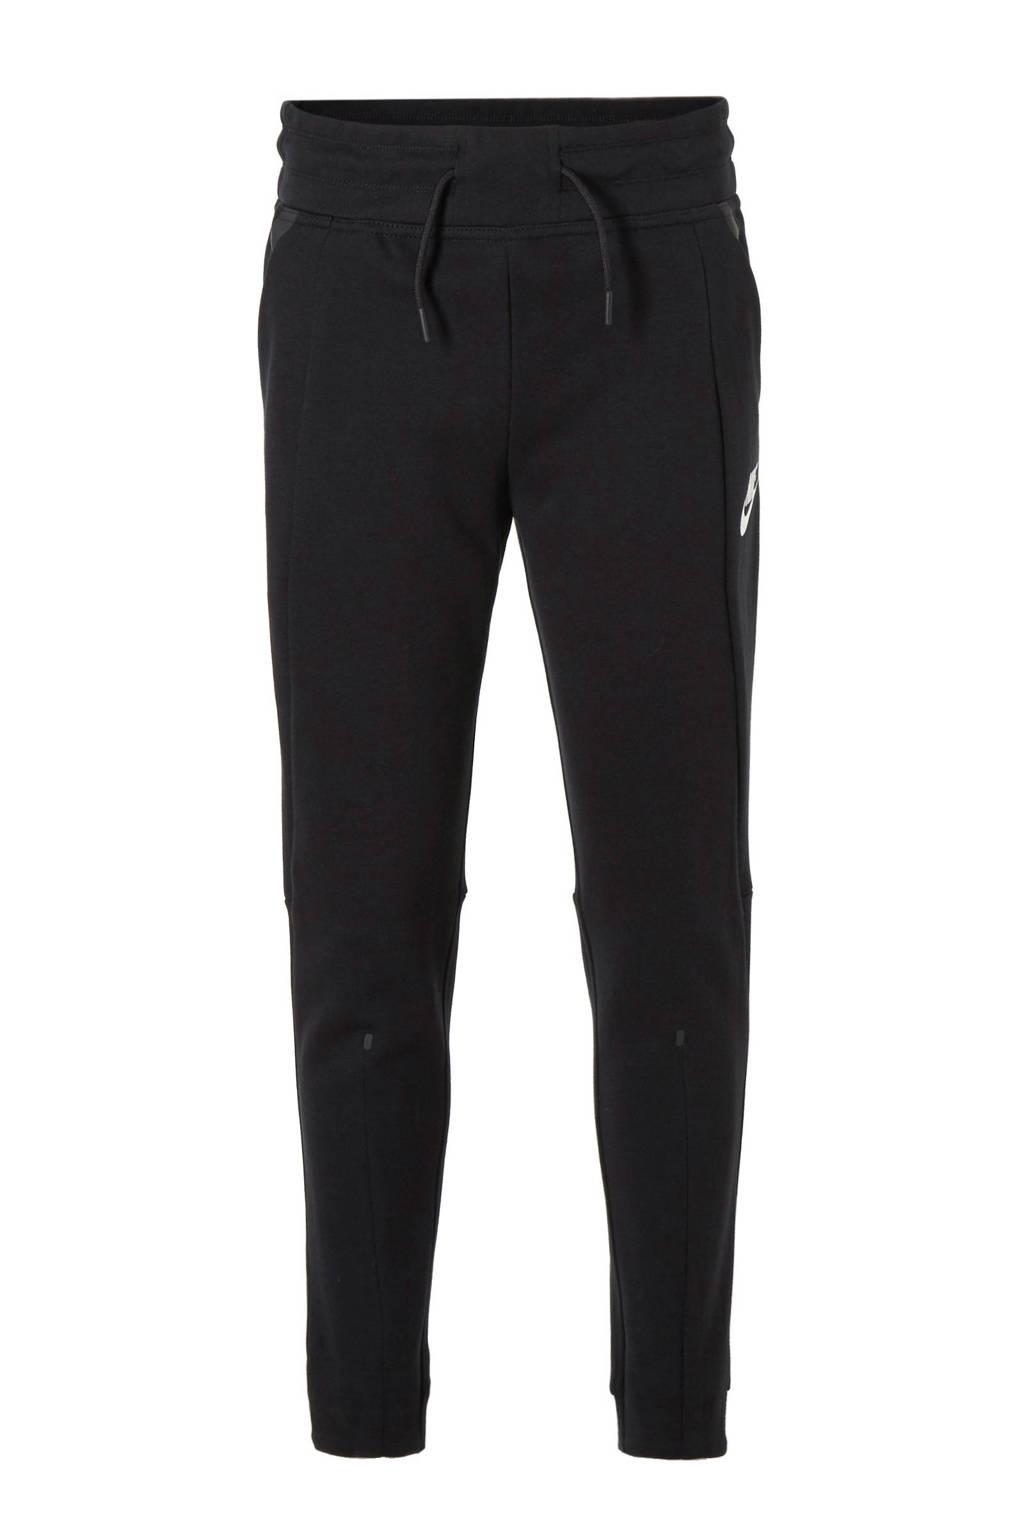 c878c1ce2f5 Nike Tech Fleece joggingbroek | wehkamp